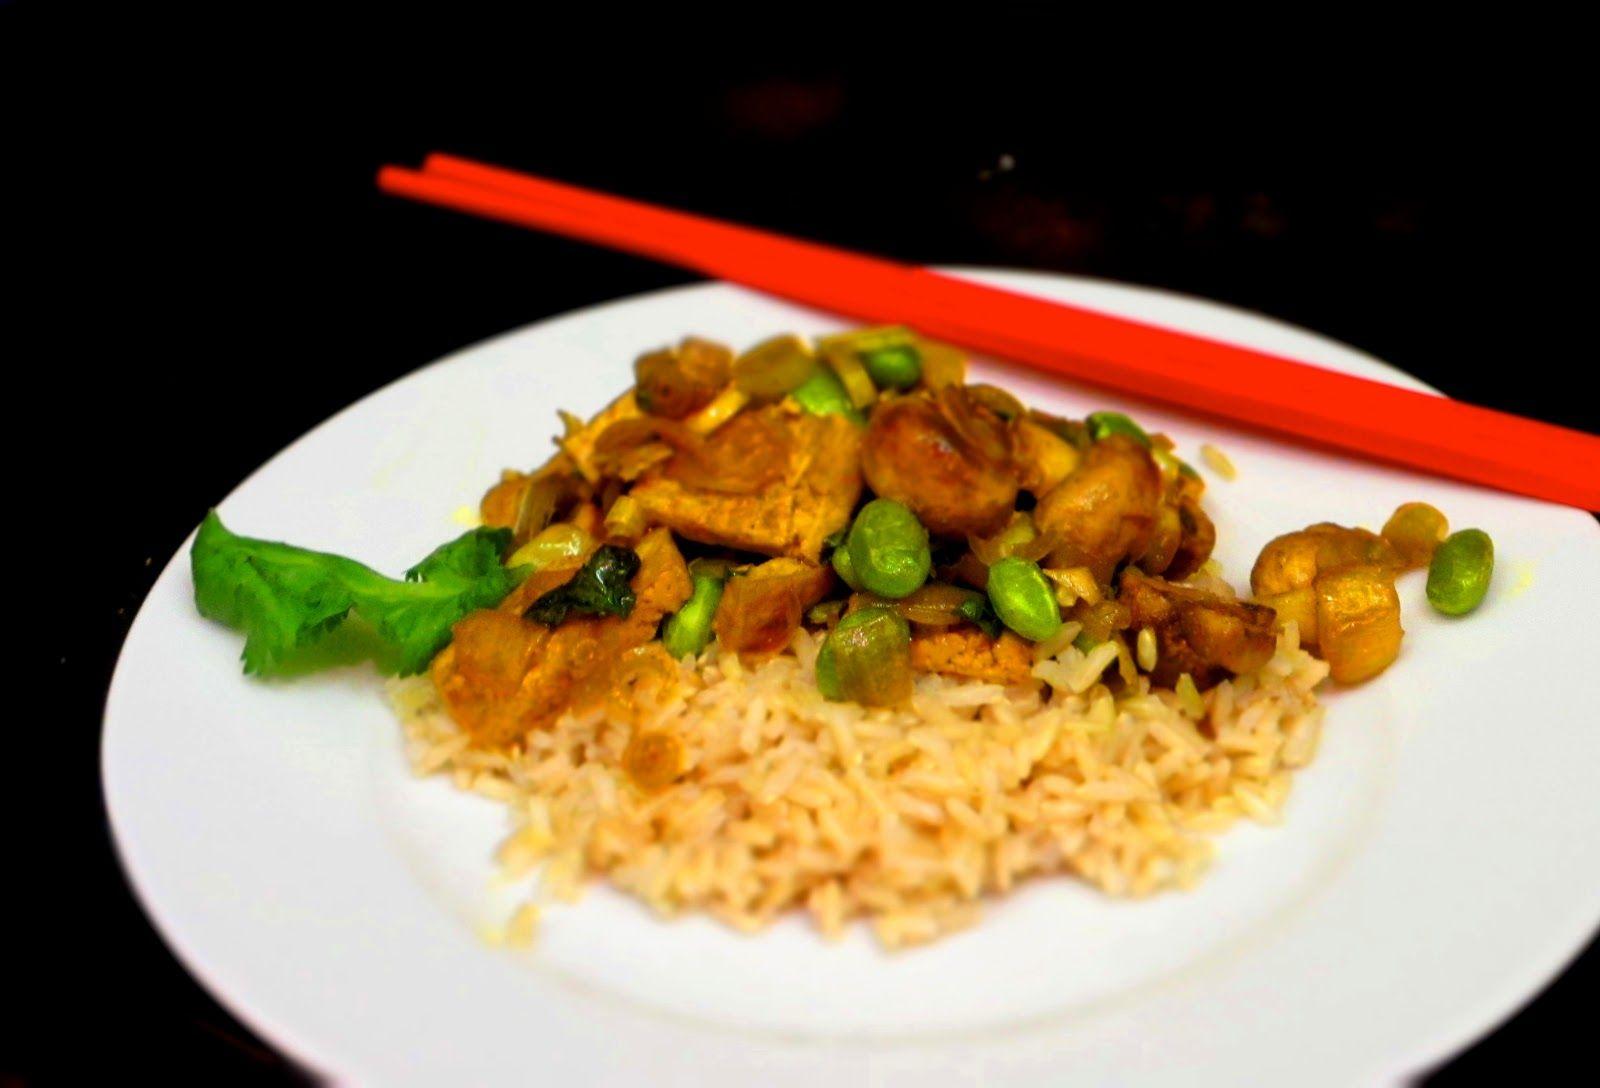 Lemongrass Tofu with Edamame and Mushrooms | Quick, Cheap Kitchen